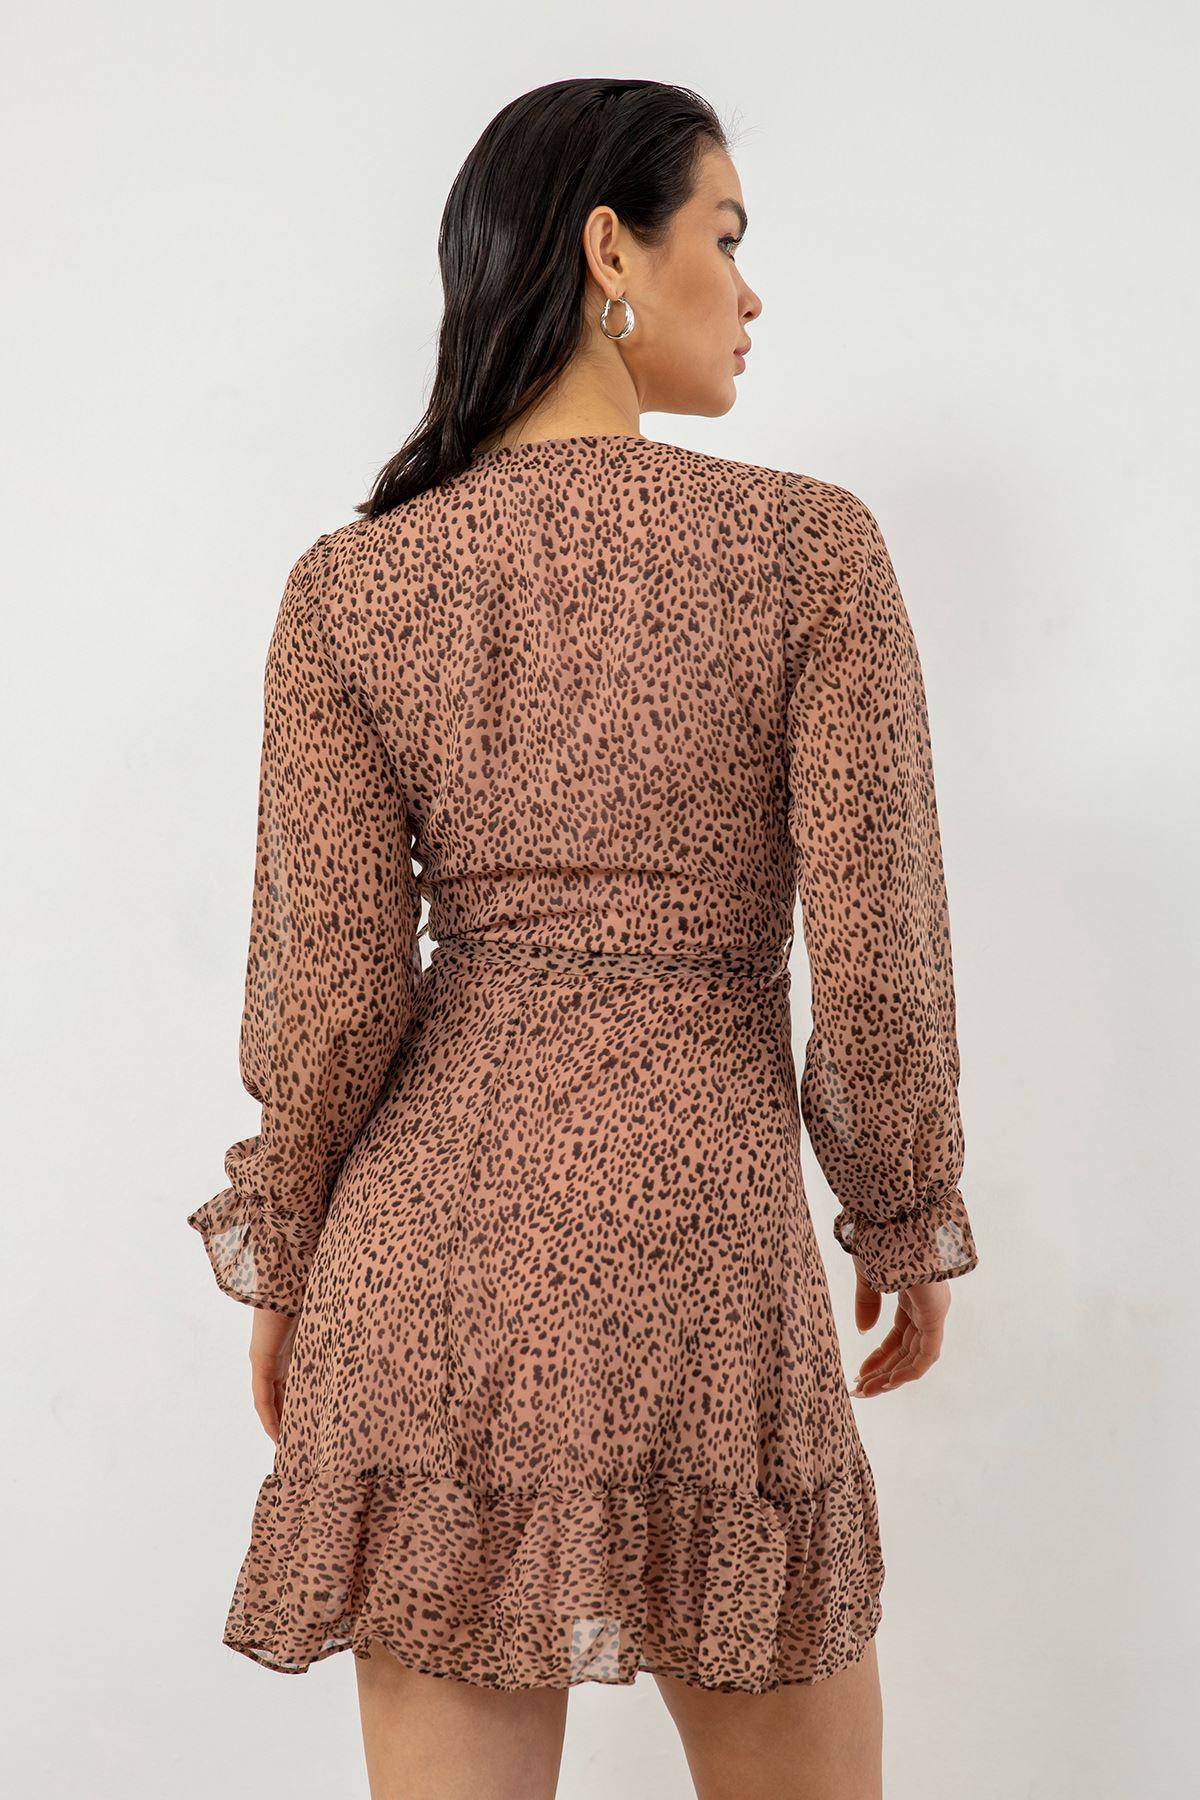 Volan Detay Şifon Elbise-Leopar